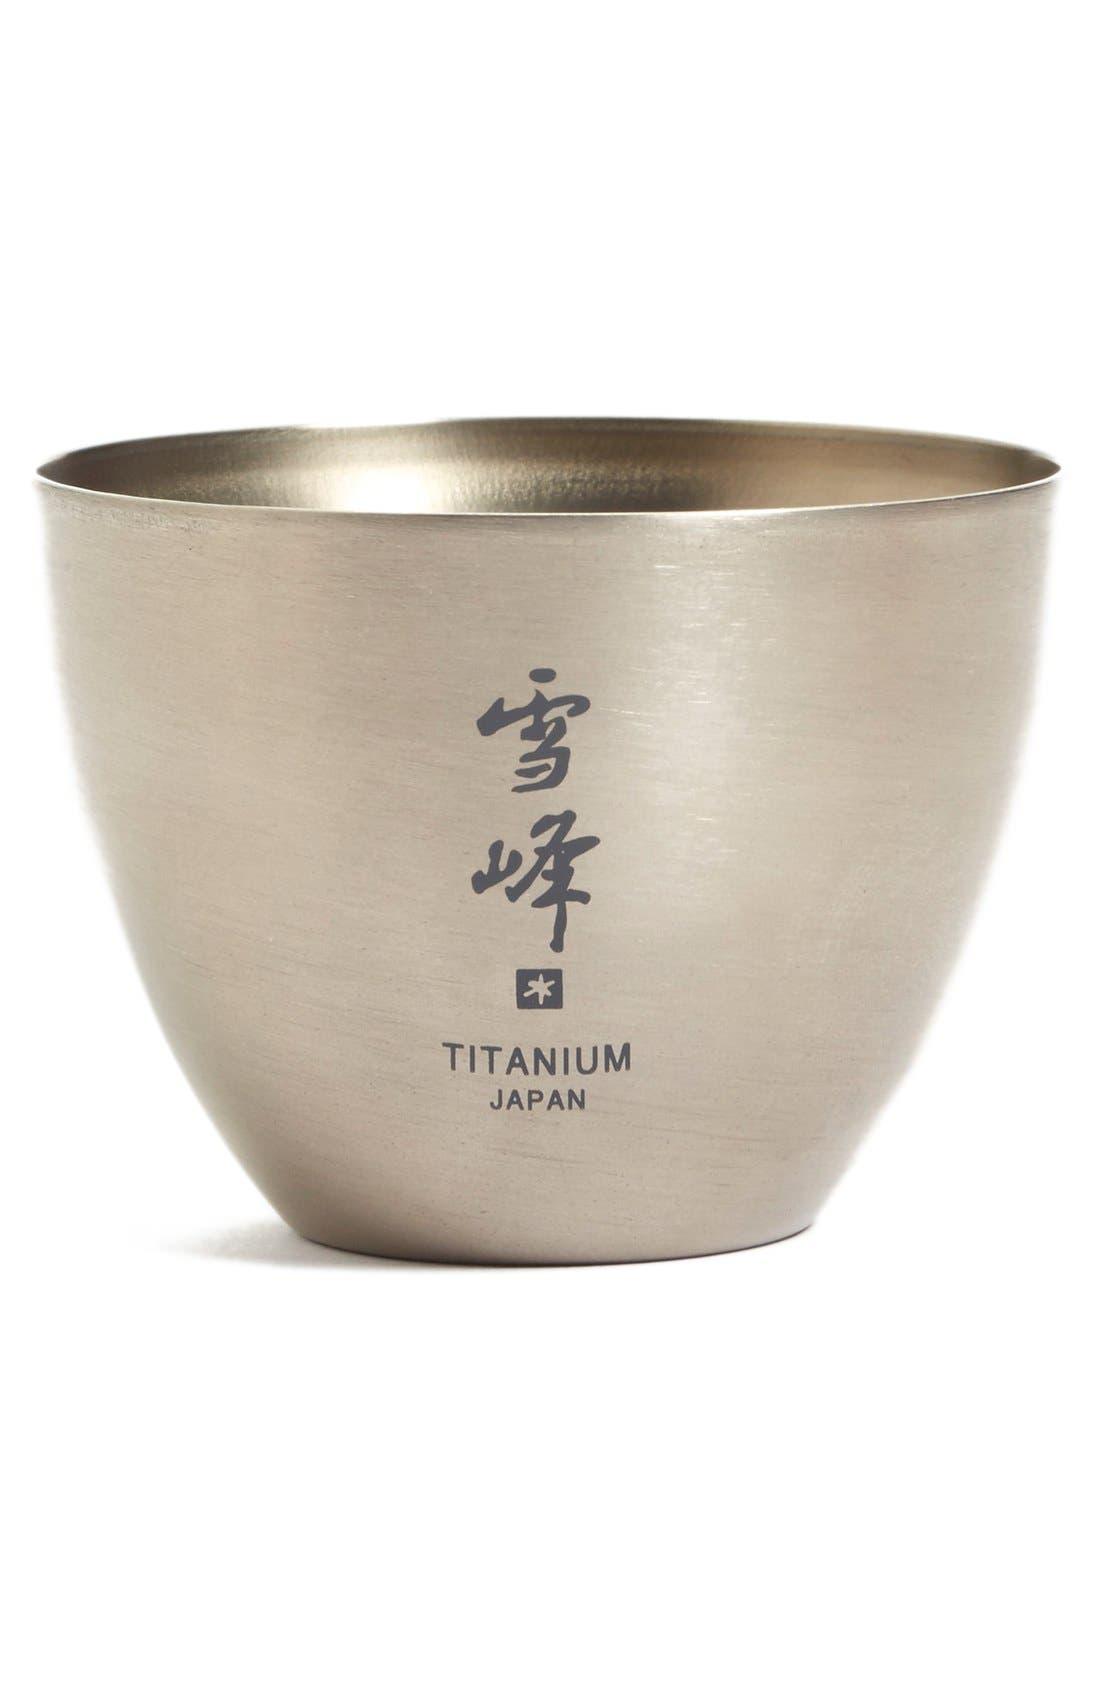 Titanium Saké Cup,                             Main thumbnail 1, color,                             041